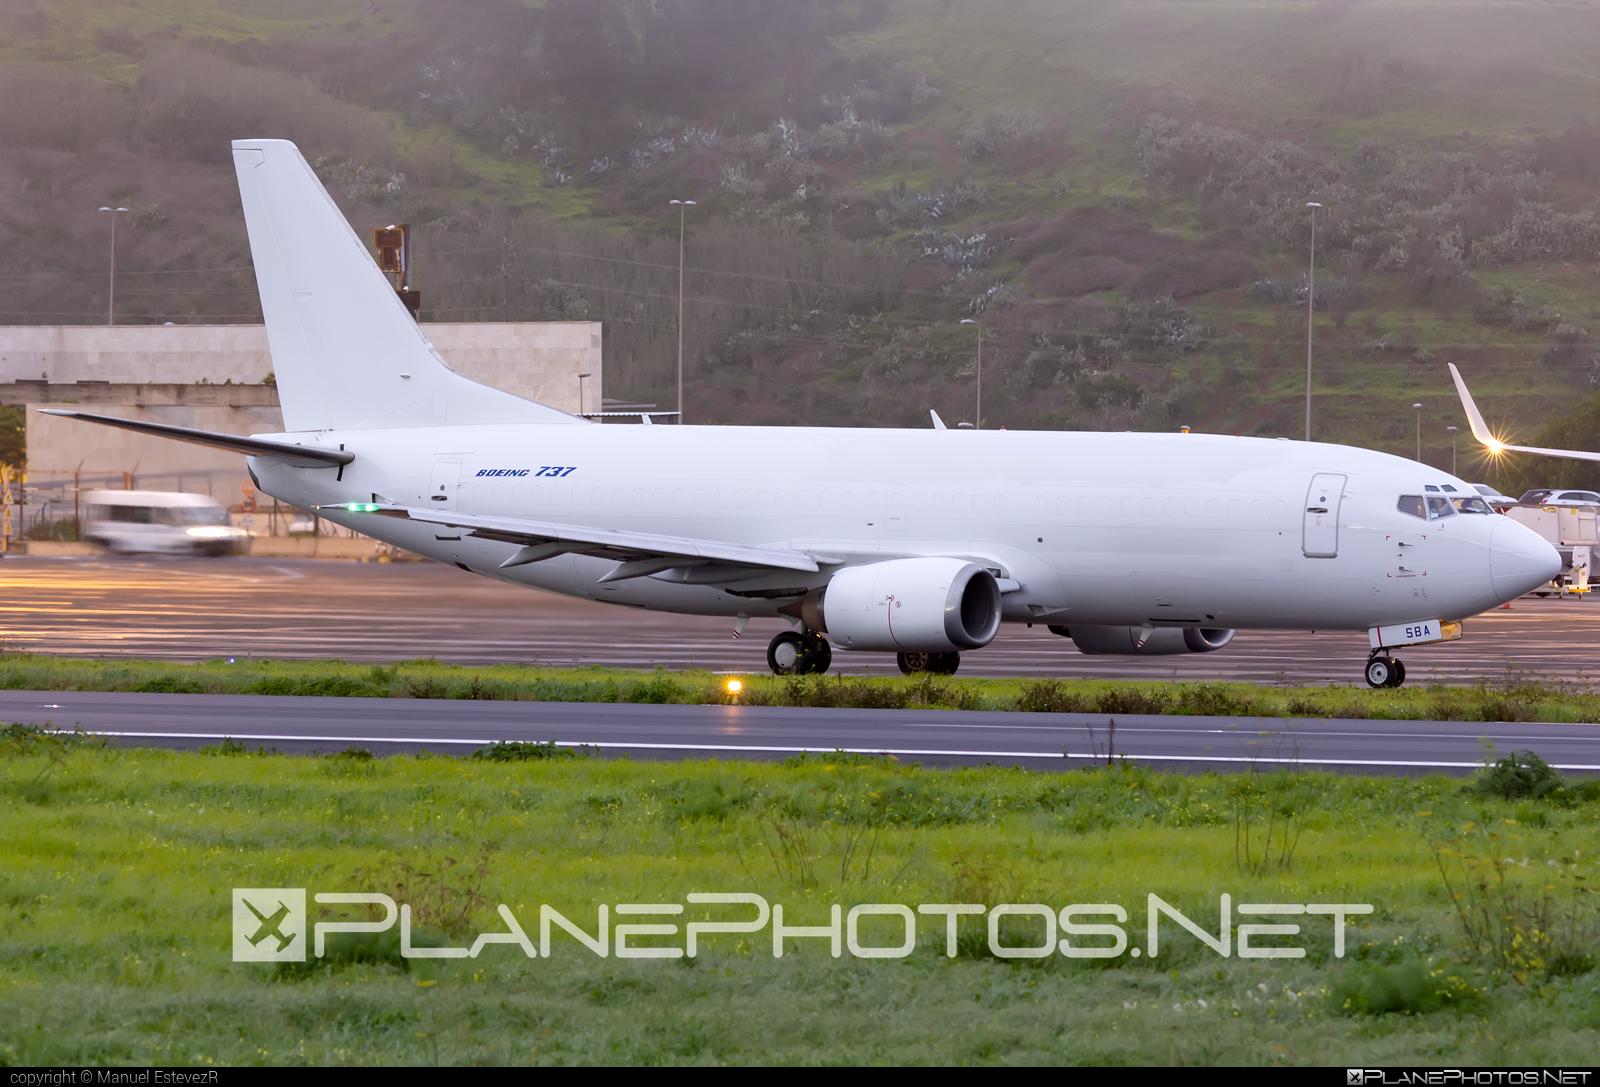 Boeing 737-300F - ZS-SBA operated by Star Air (BRH) #b737 #b737f #b737freighter #boeing #boeing737 #starair